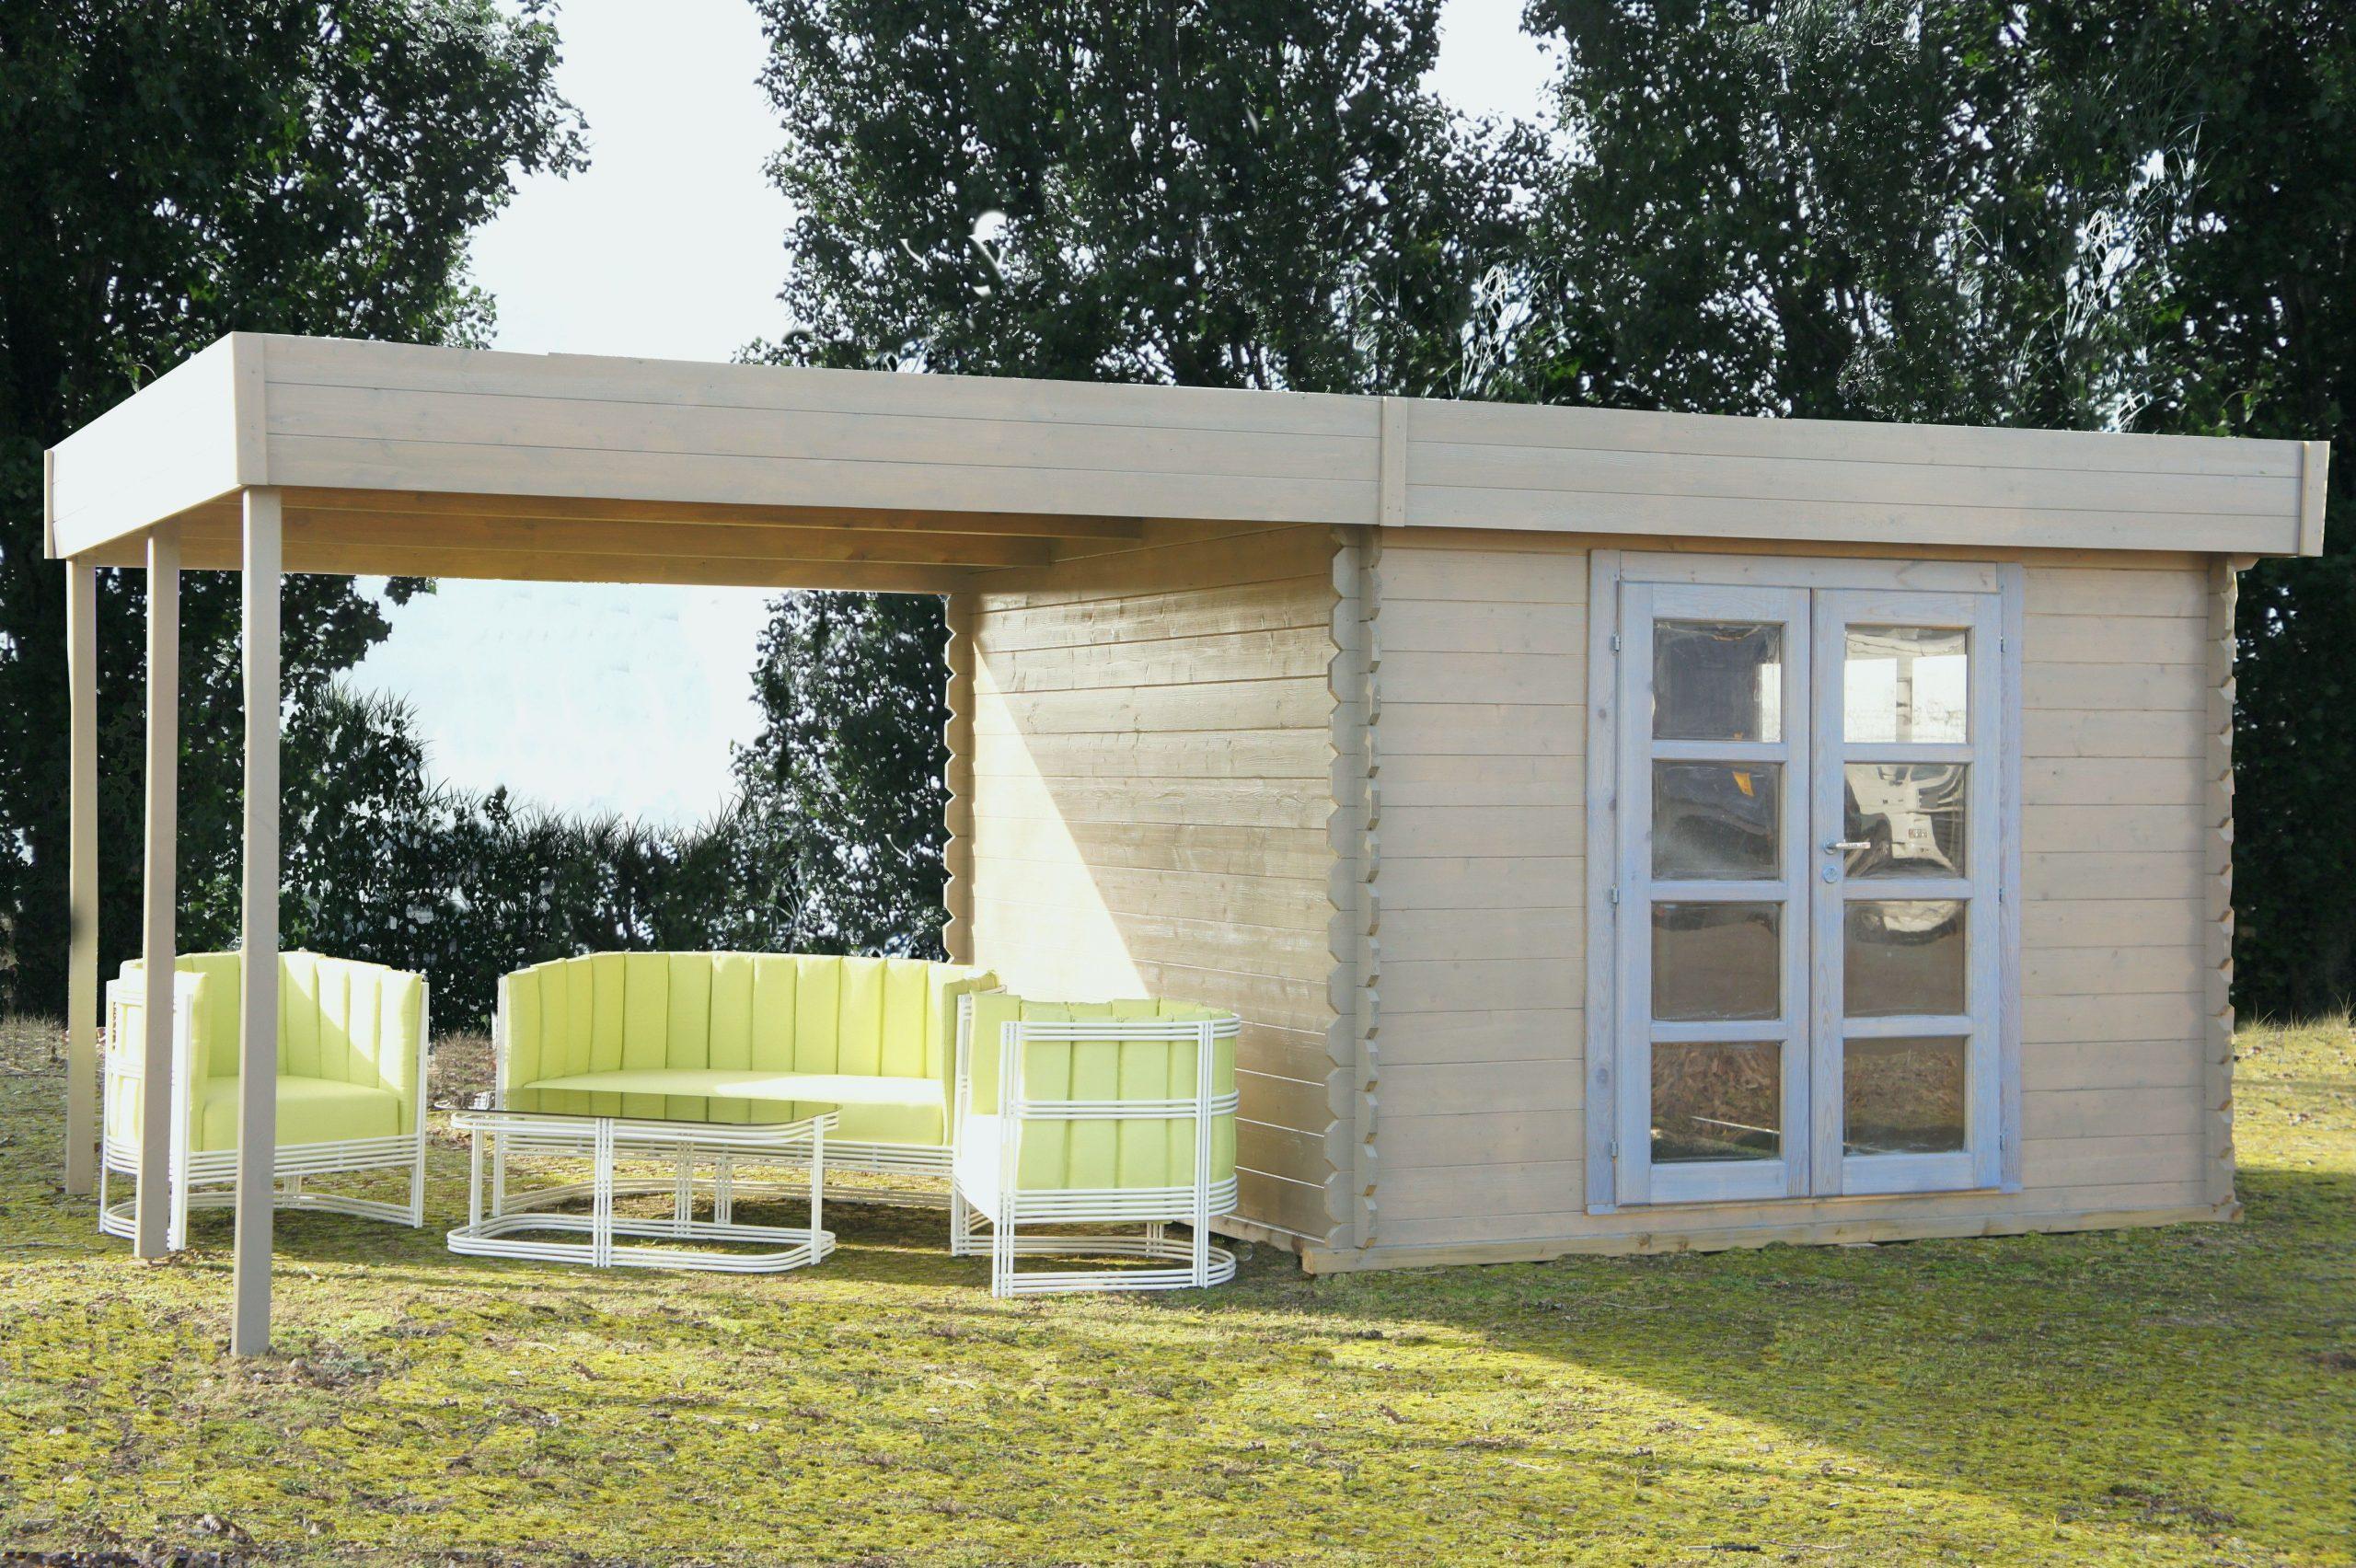 Fresh Chalet De Jardin Castorama | Pergola, Backyard, Indoor ... avec Abri De Jardin Belgique Tournai